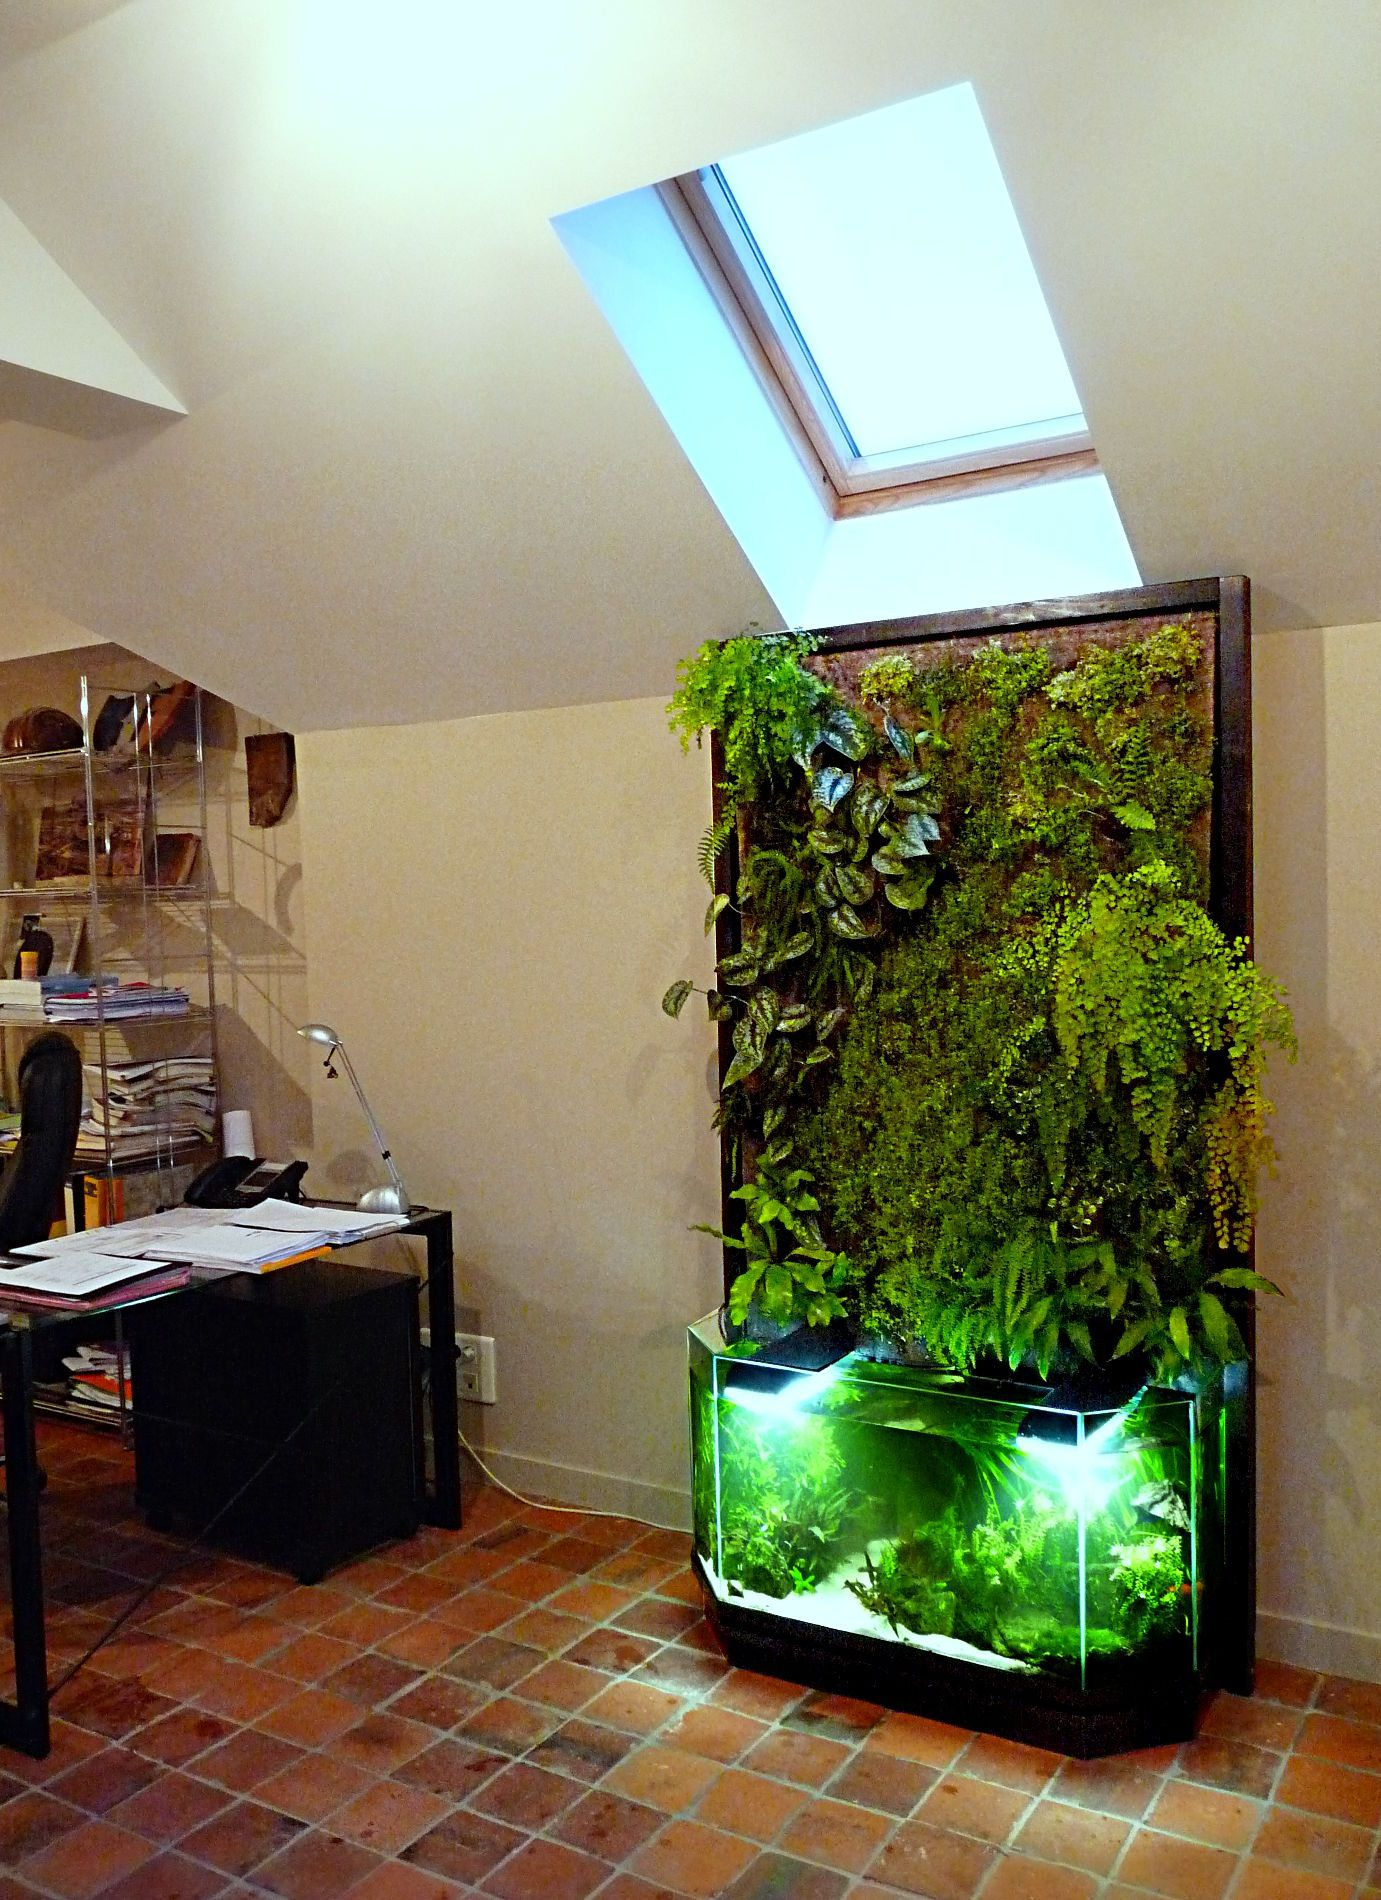 mur v g tal int rieur en aquaponie filtration bassin et aquarium pinterest mur vegetal. Black Bedroom Furniture Sets. Home Design Ideas